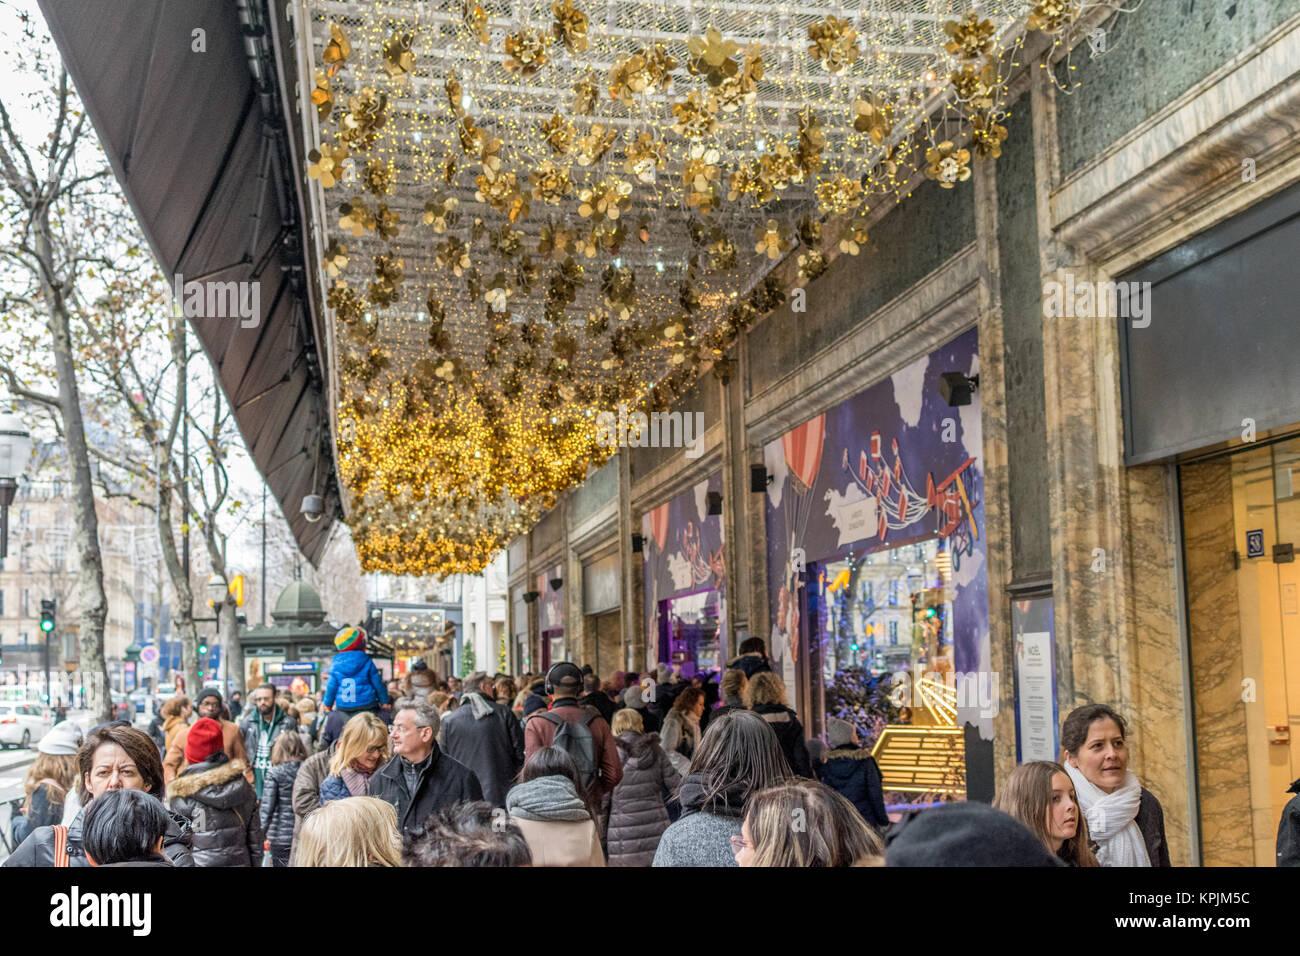 Paris, France. 16th December, 2017. Boulevard Haussmann, Paris, France - December 16, 2017 : Crowds gather to see - Stock Image